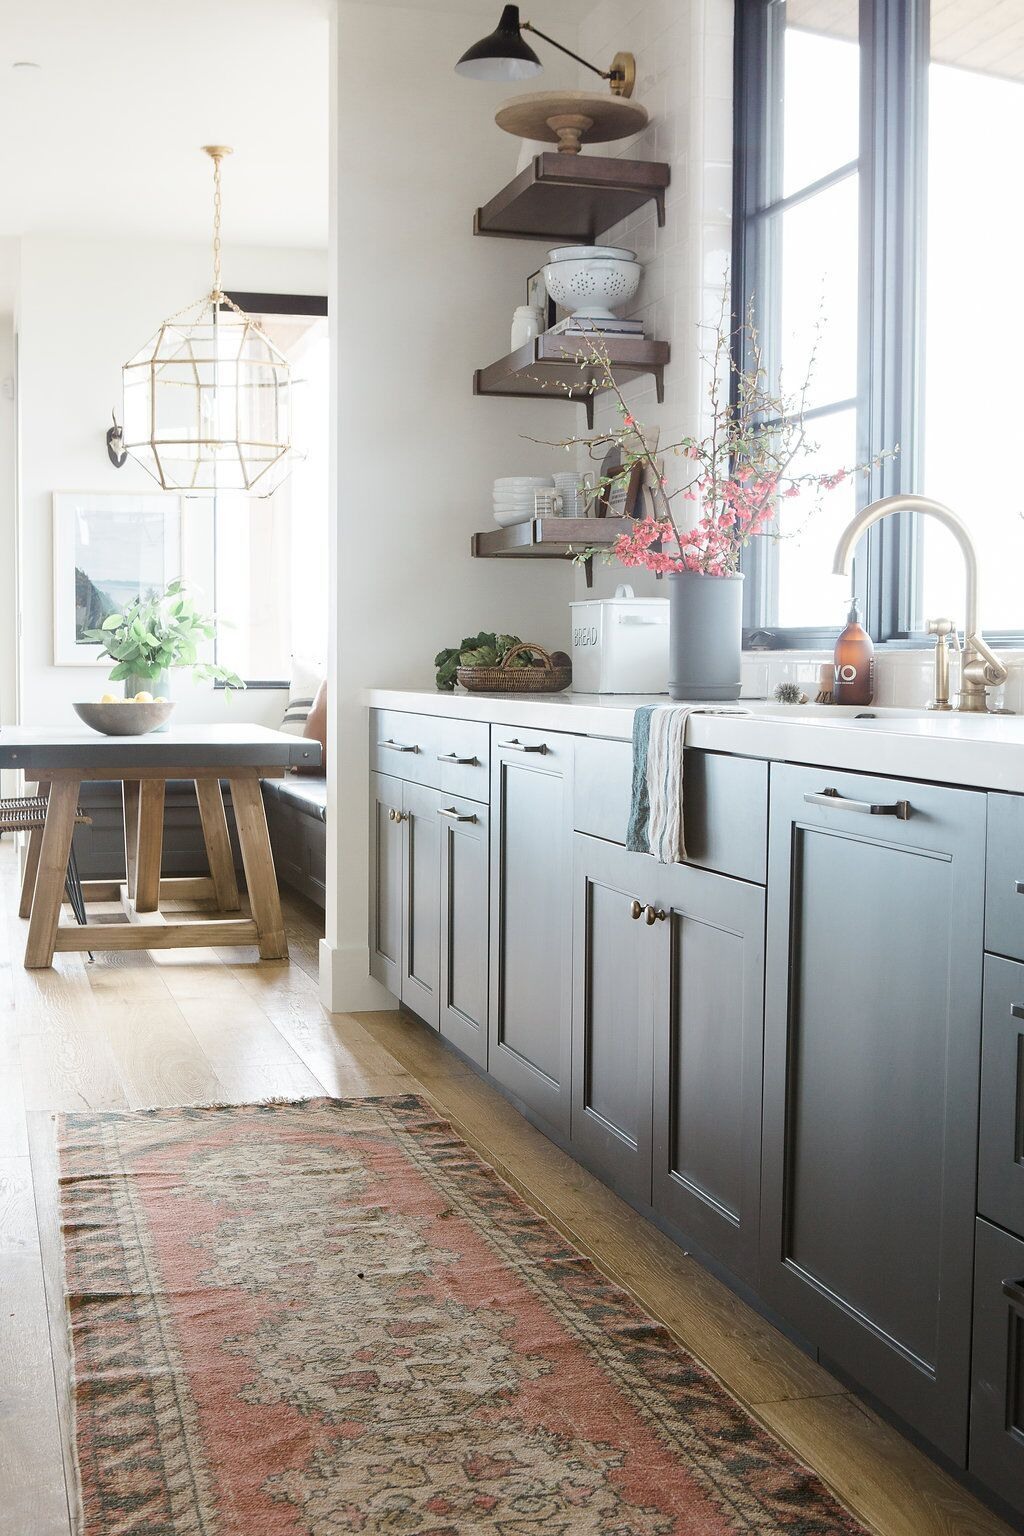 Eleanor backhouse eleanorbackhousus ideas on pinterest